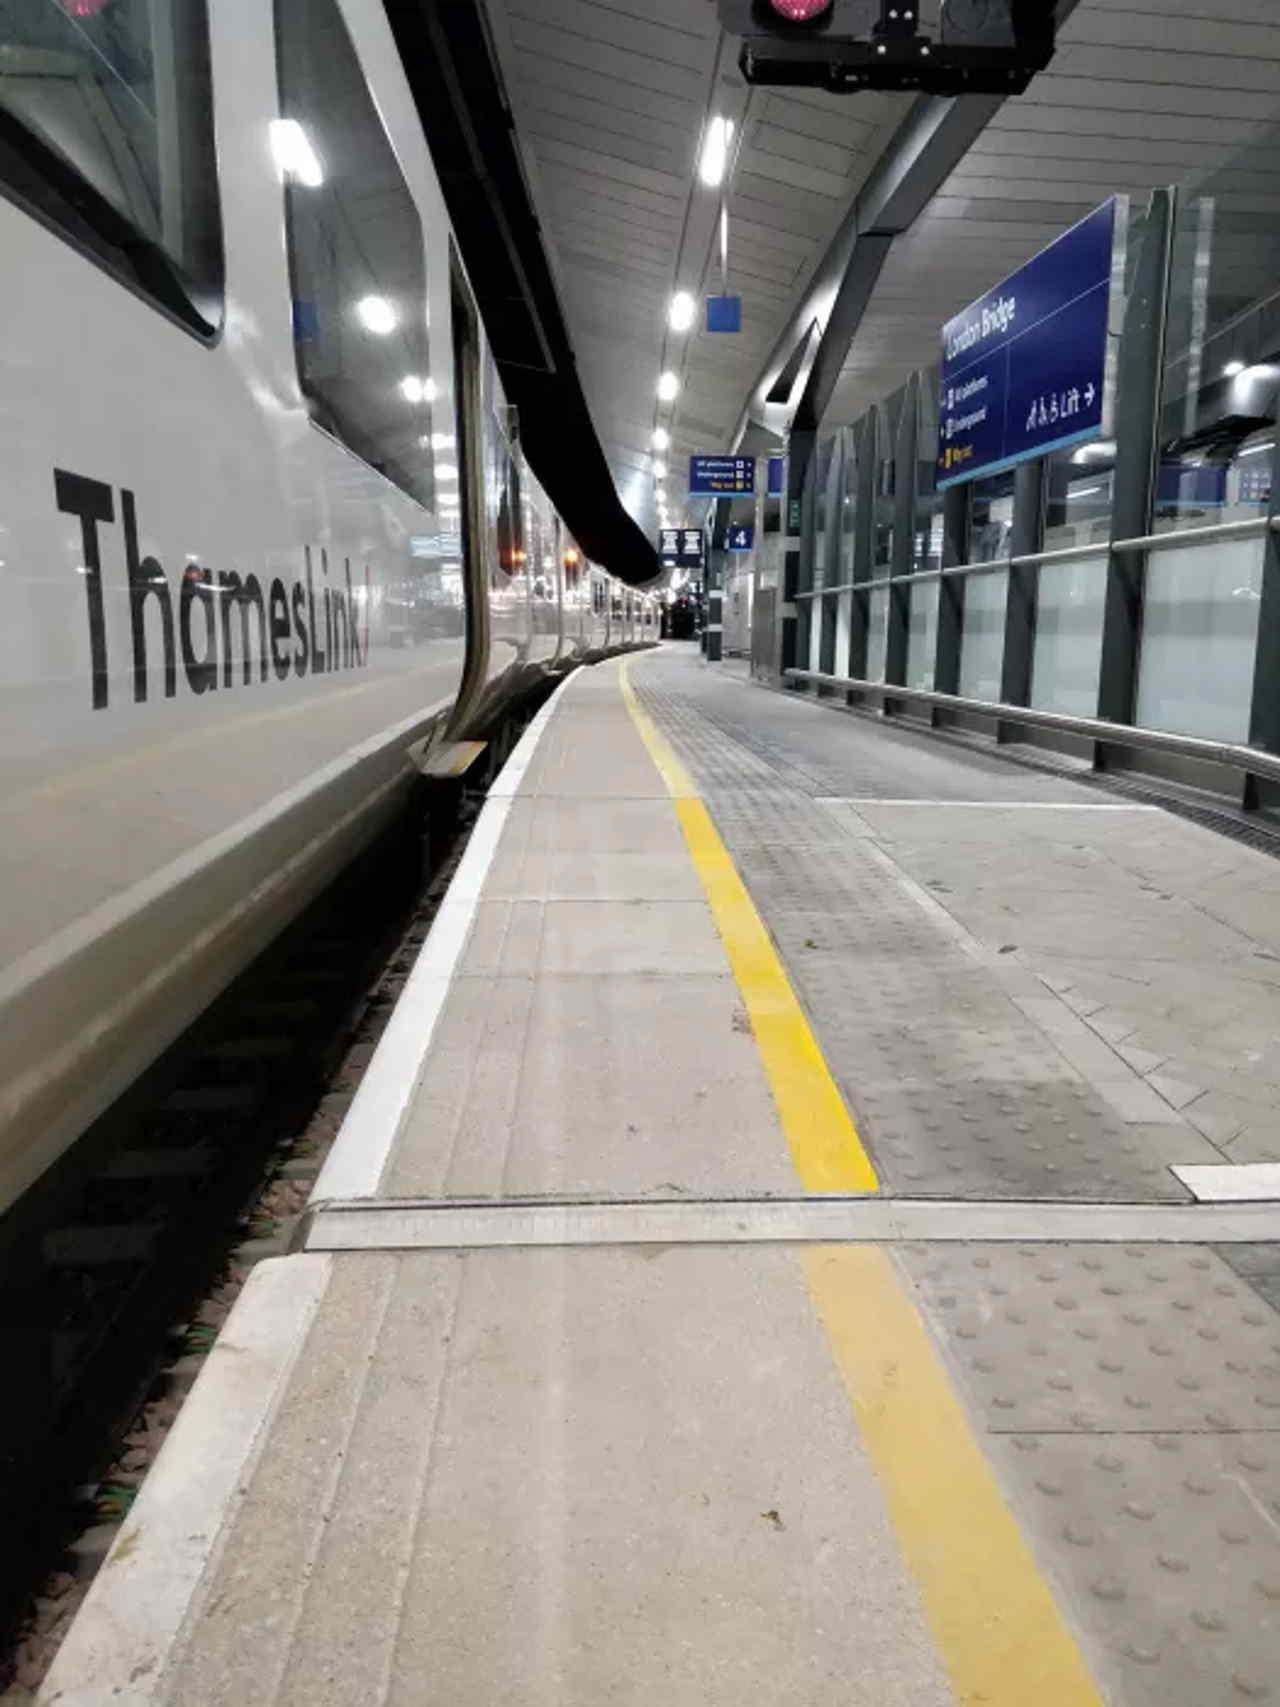 New trains between Peterborough Horsham and London